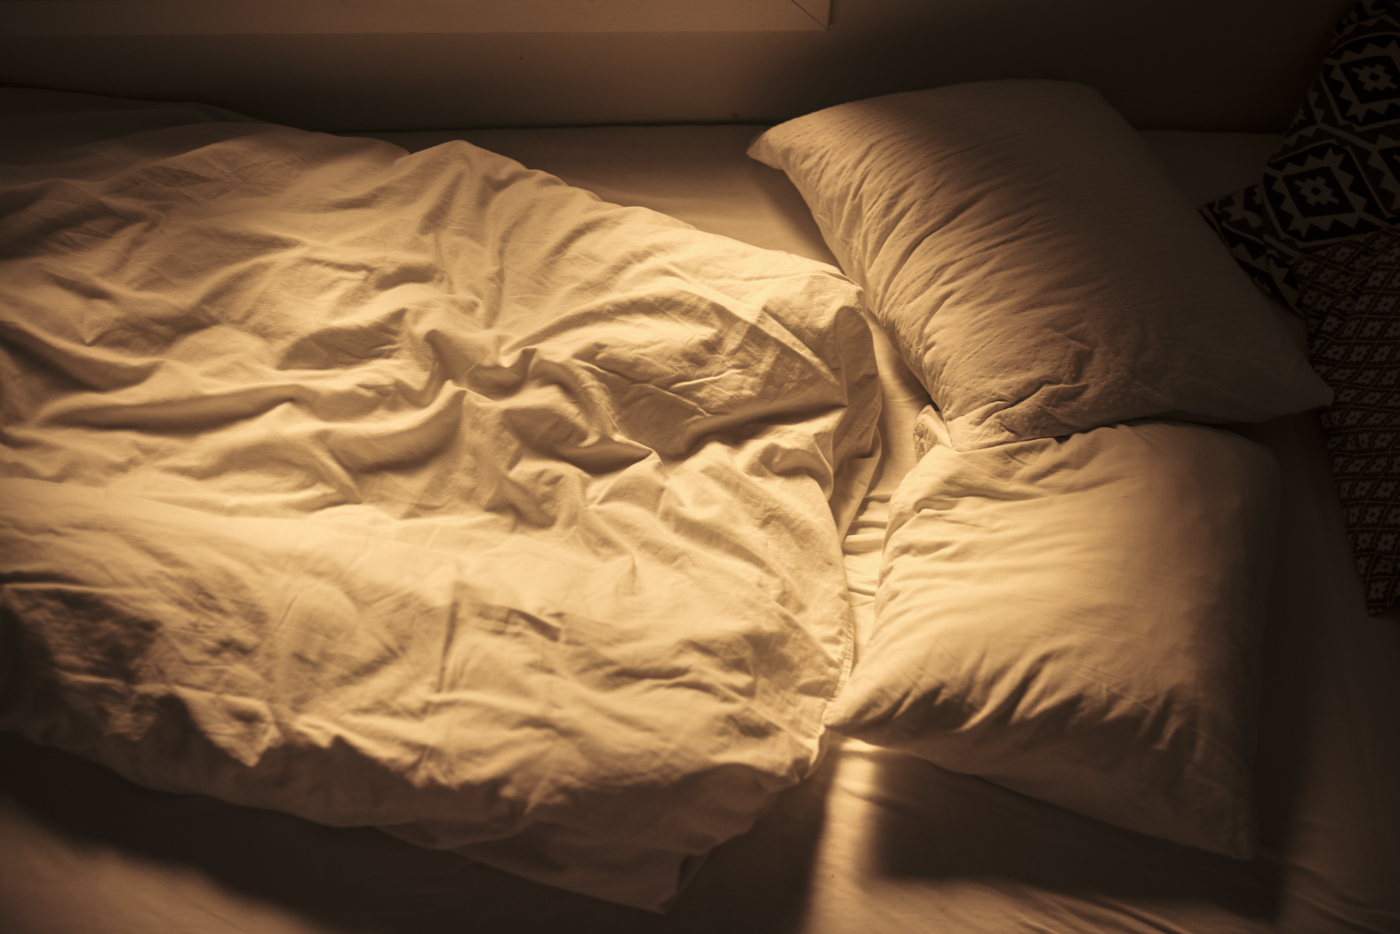 søvnprovblemer, st. hanshaugen søvnklinikk